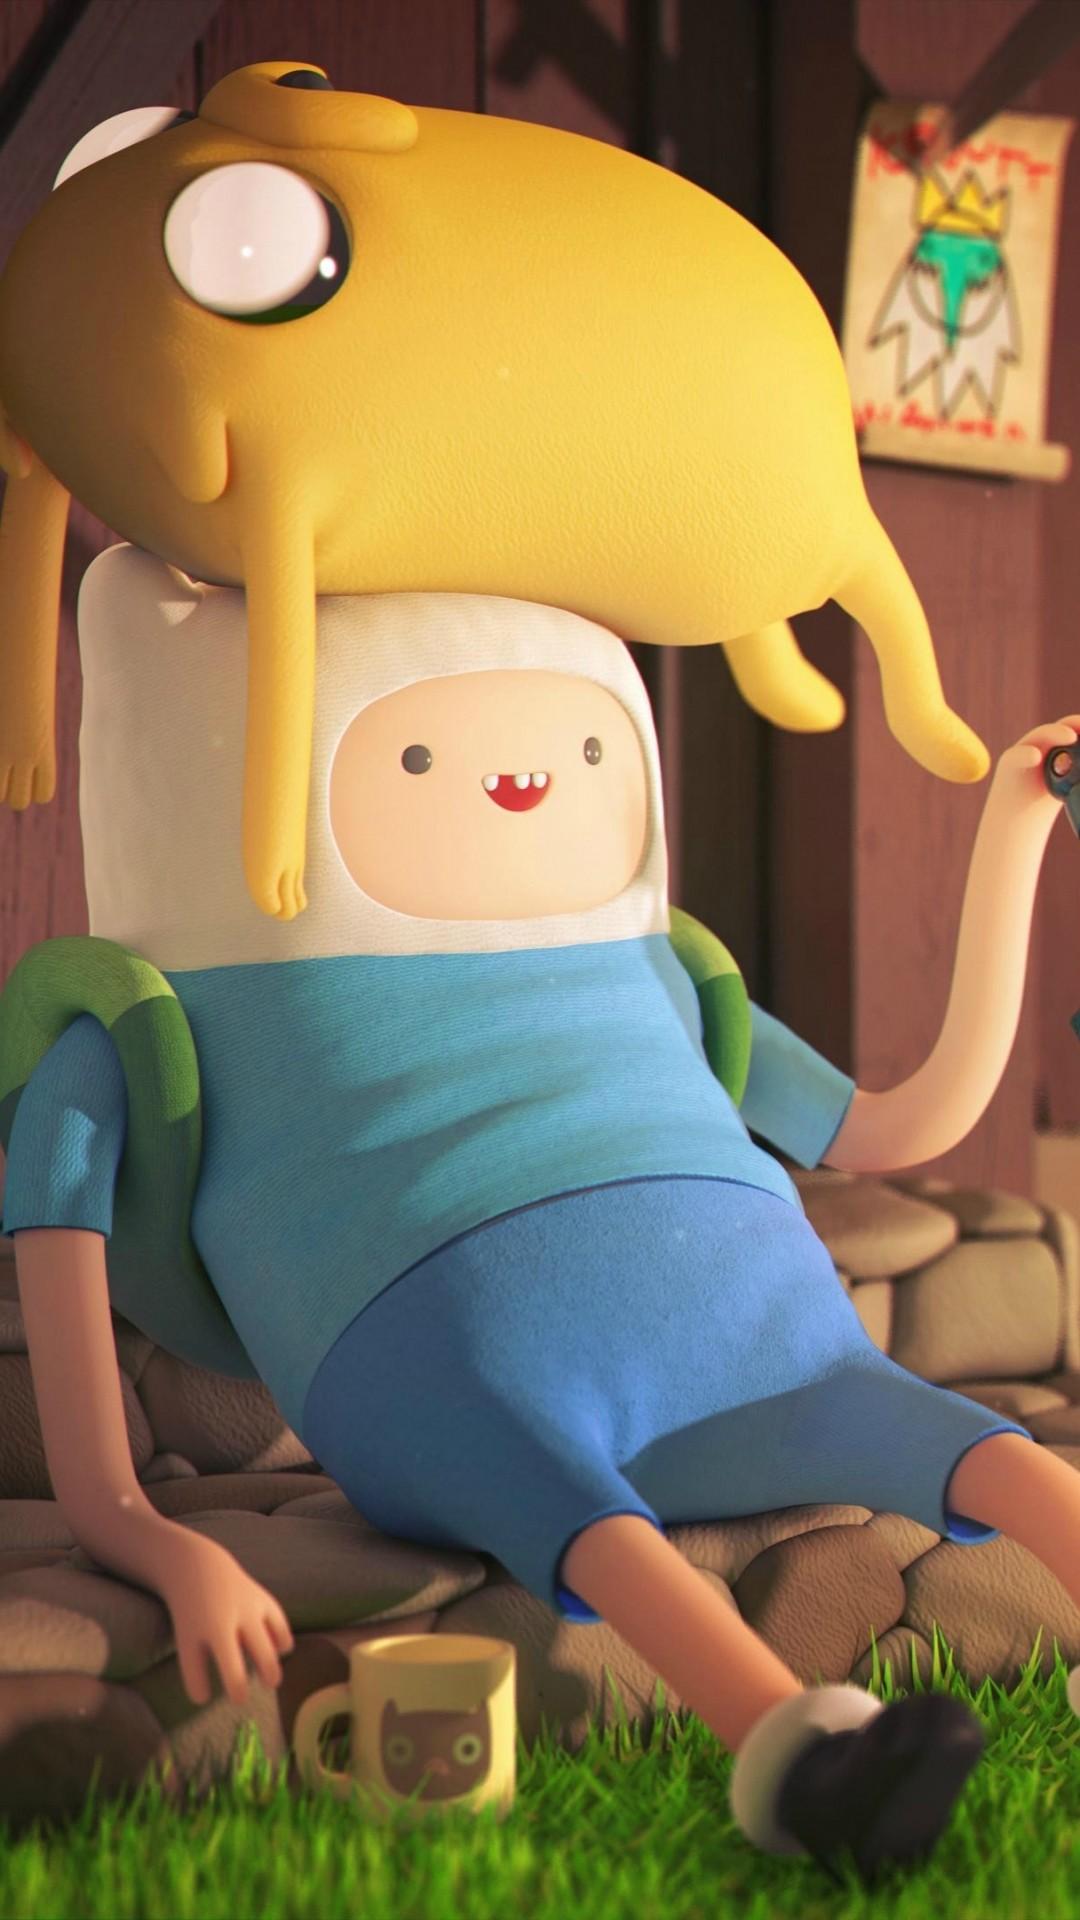 Adventure Time Wallpaper Iphone 183 ① Wallpapertag